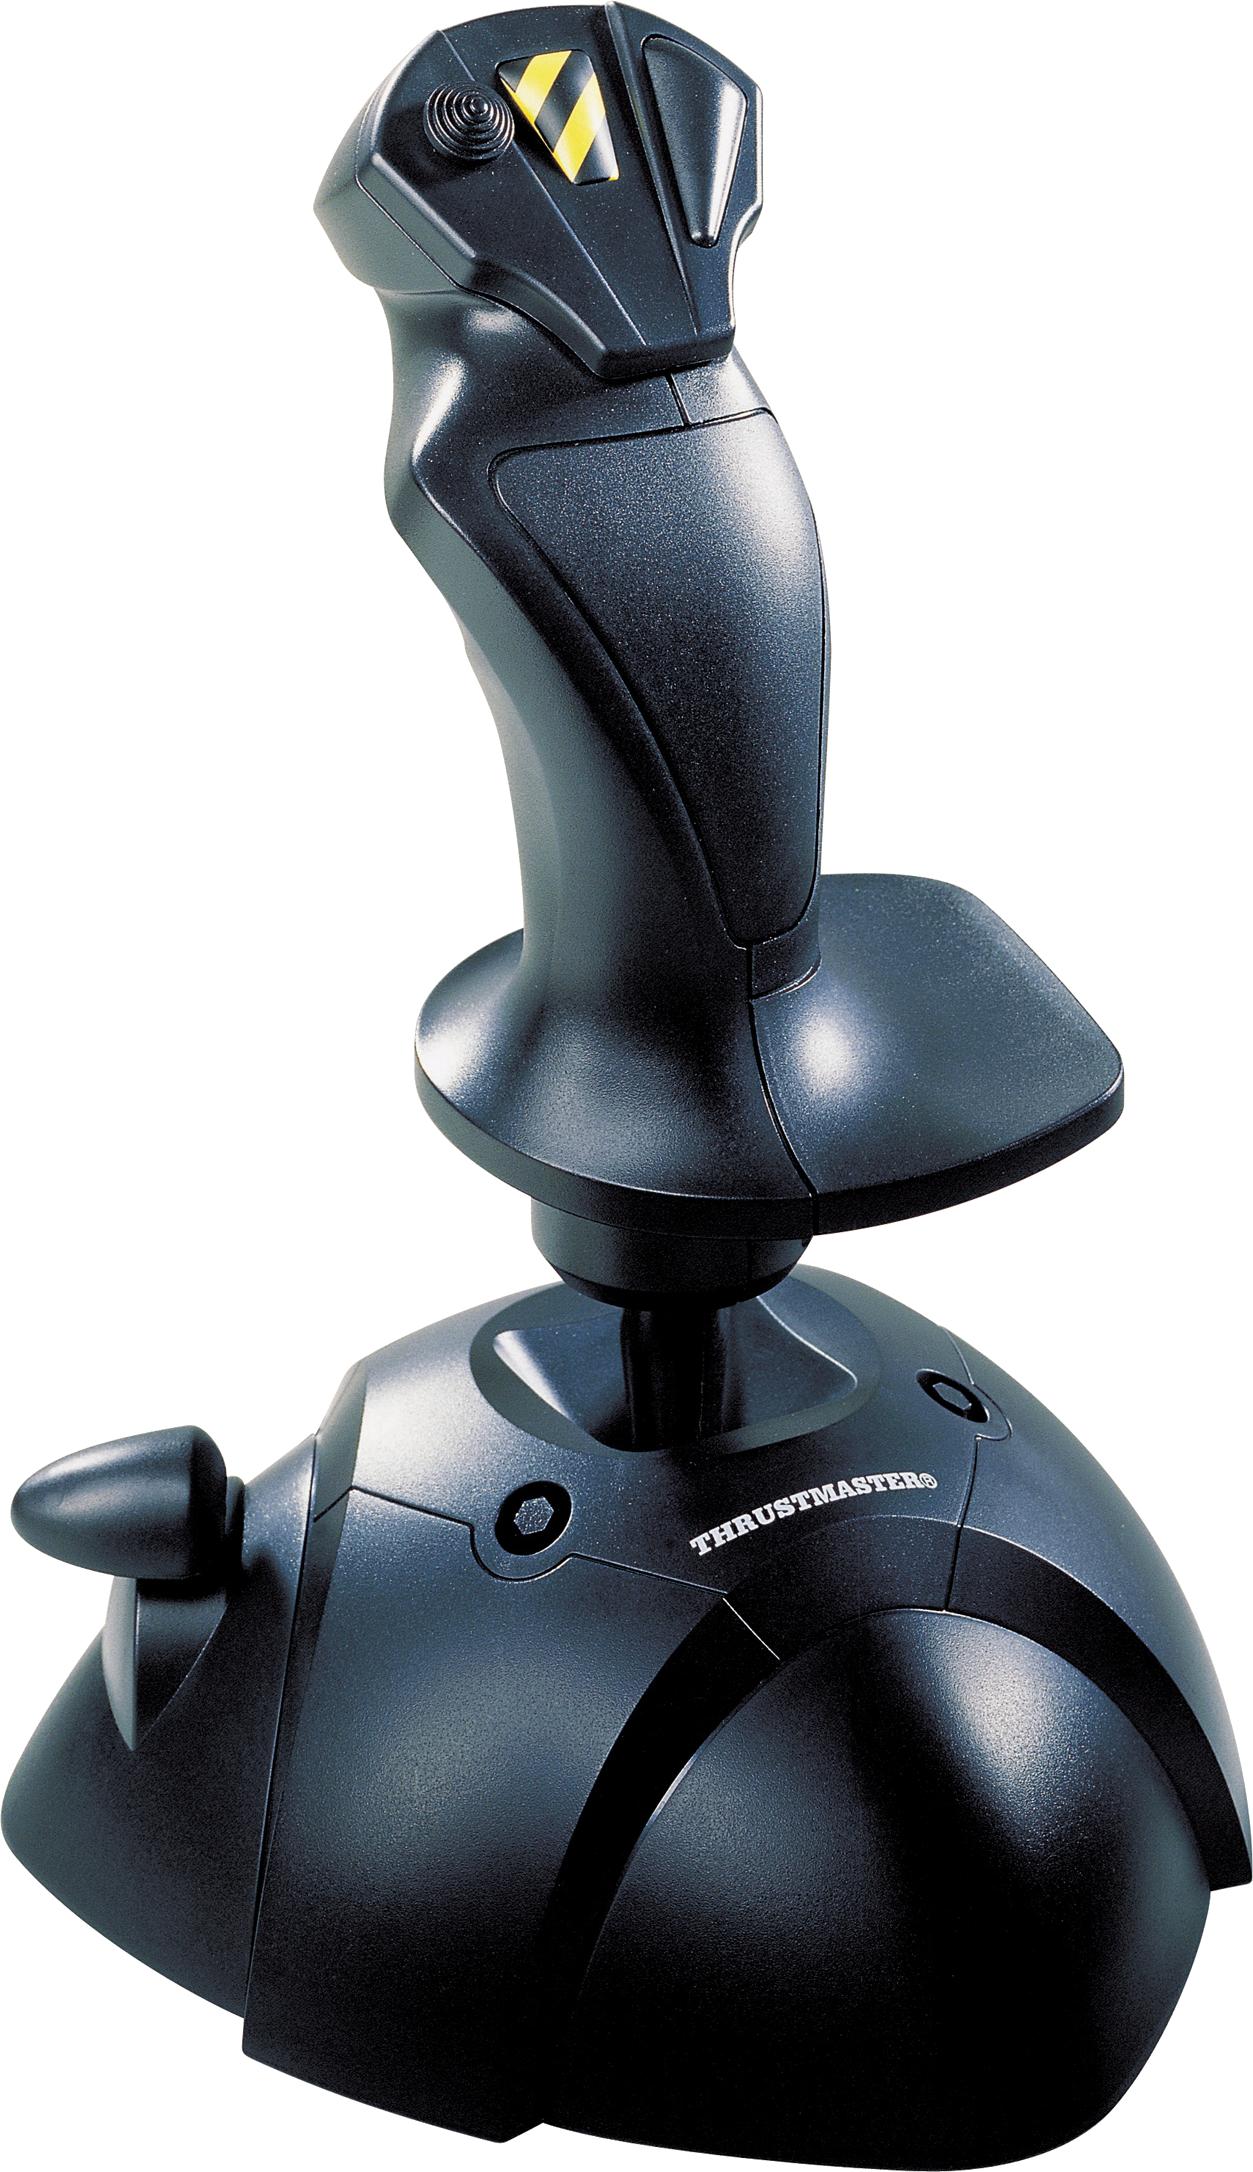 Thrustmaster Black Joystick PNG Image